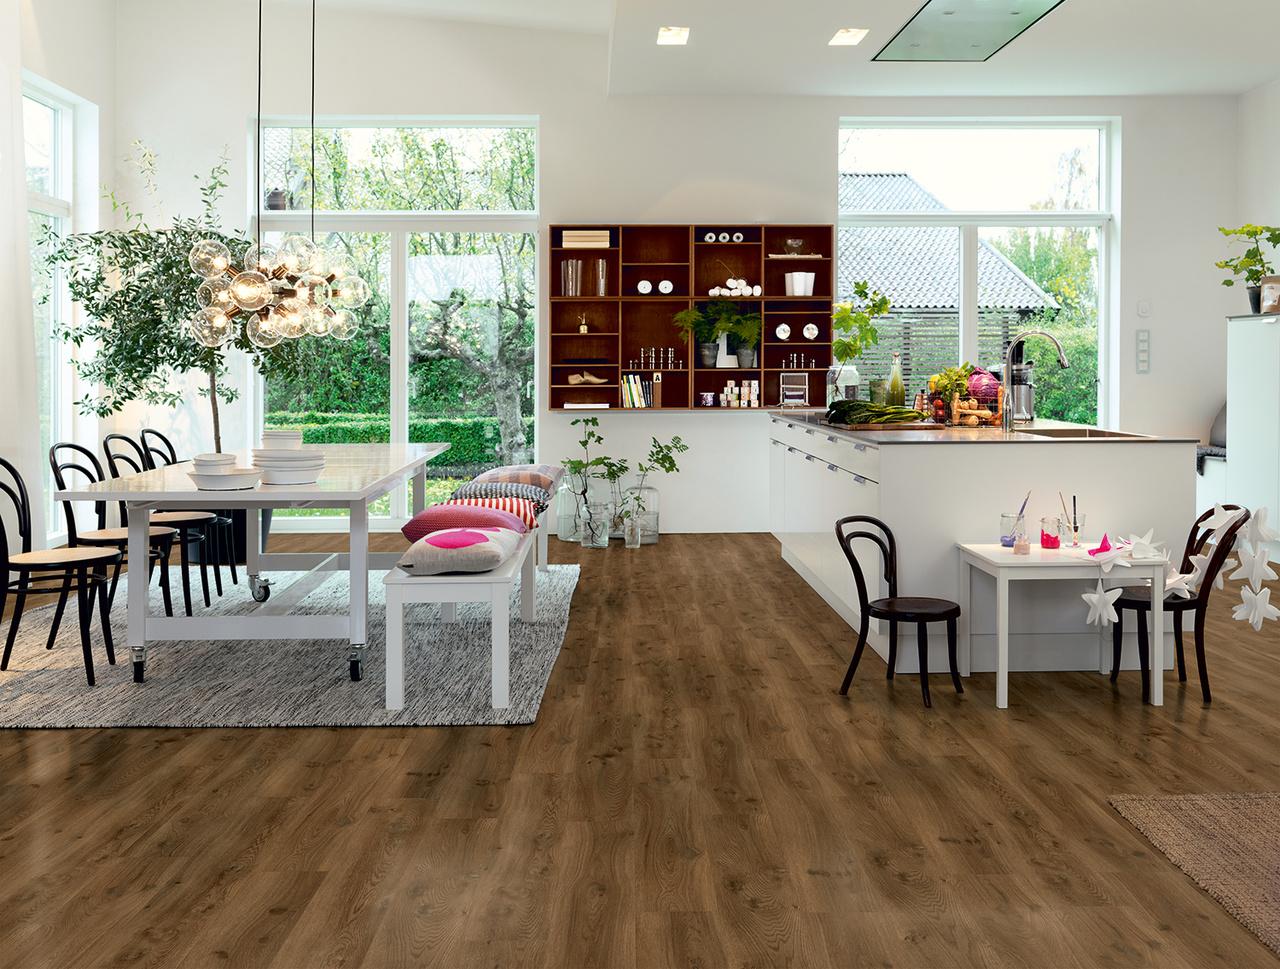 nyhet den nya generationens vinylgolv floors for real life. Black Bedroom Furniture Sets. Home Design Ideas